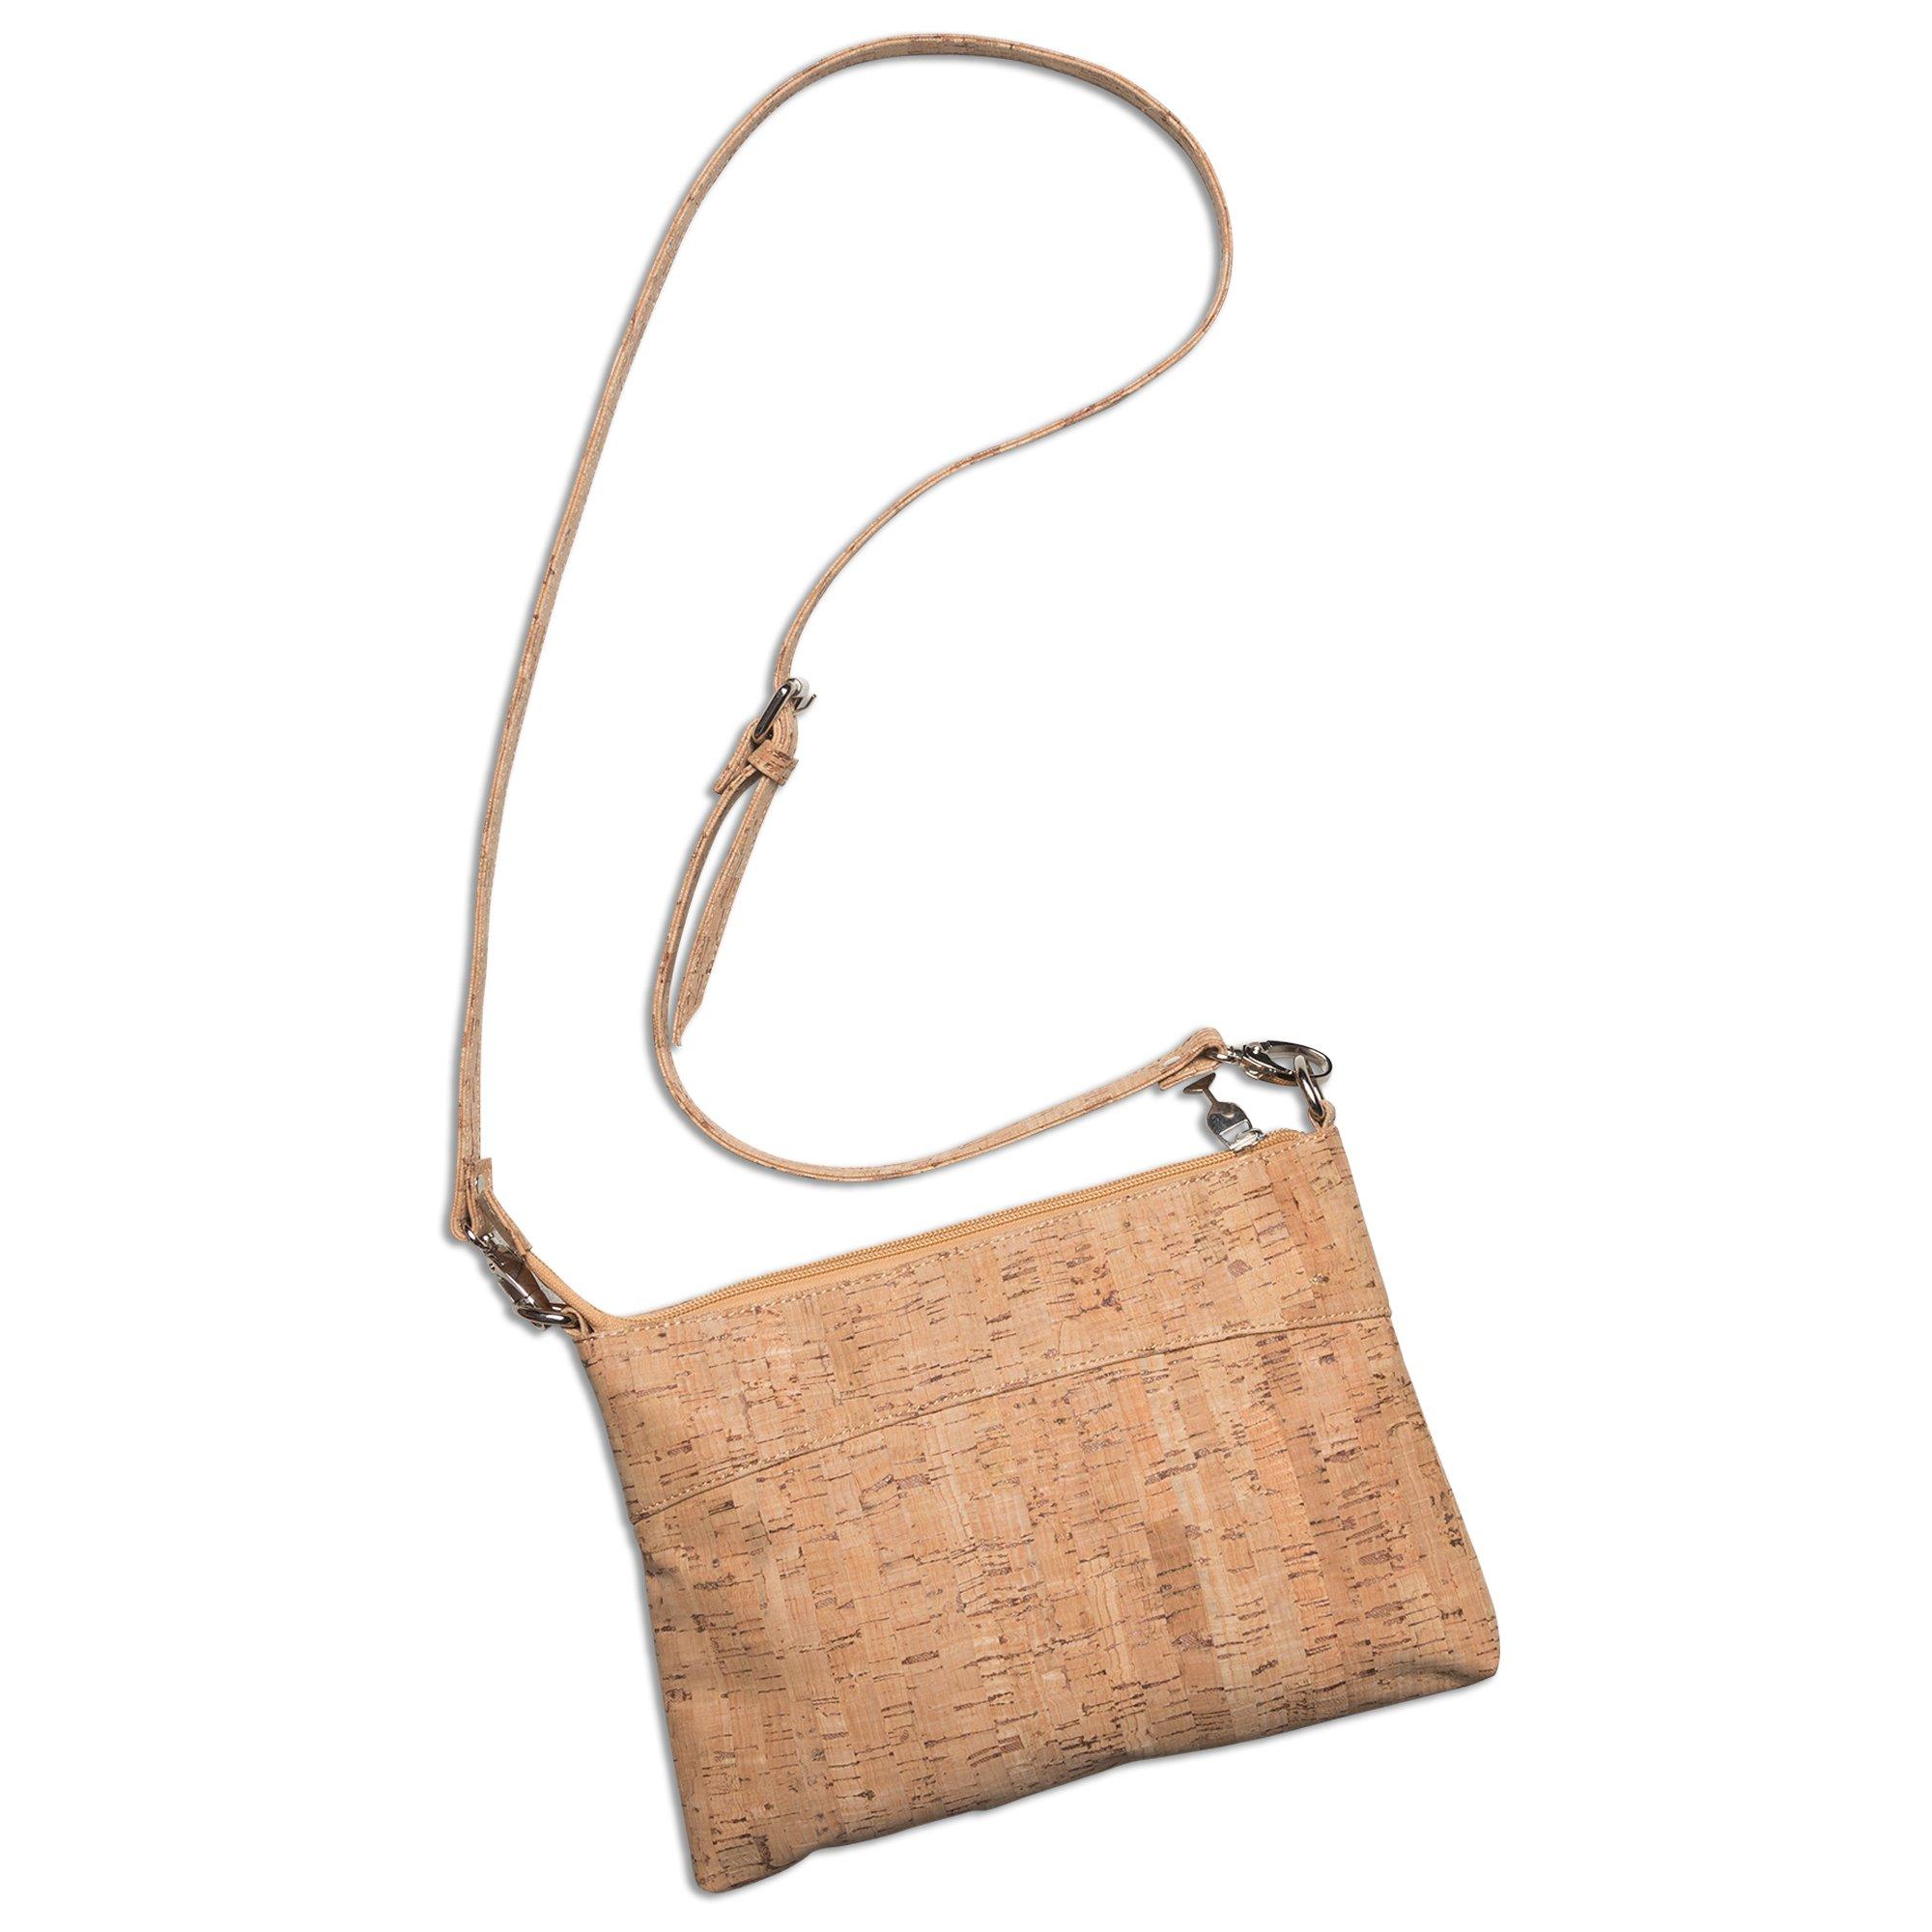 Cork Eco-friendly Cross Body Women Clutch Shoulder Hand Bags Adjustable Straps-Sturdy Ladies Evening Purse by Chris's Stuff